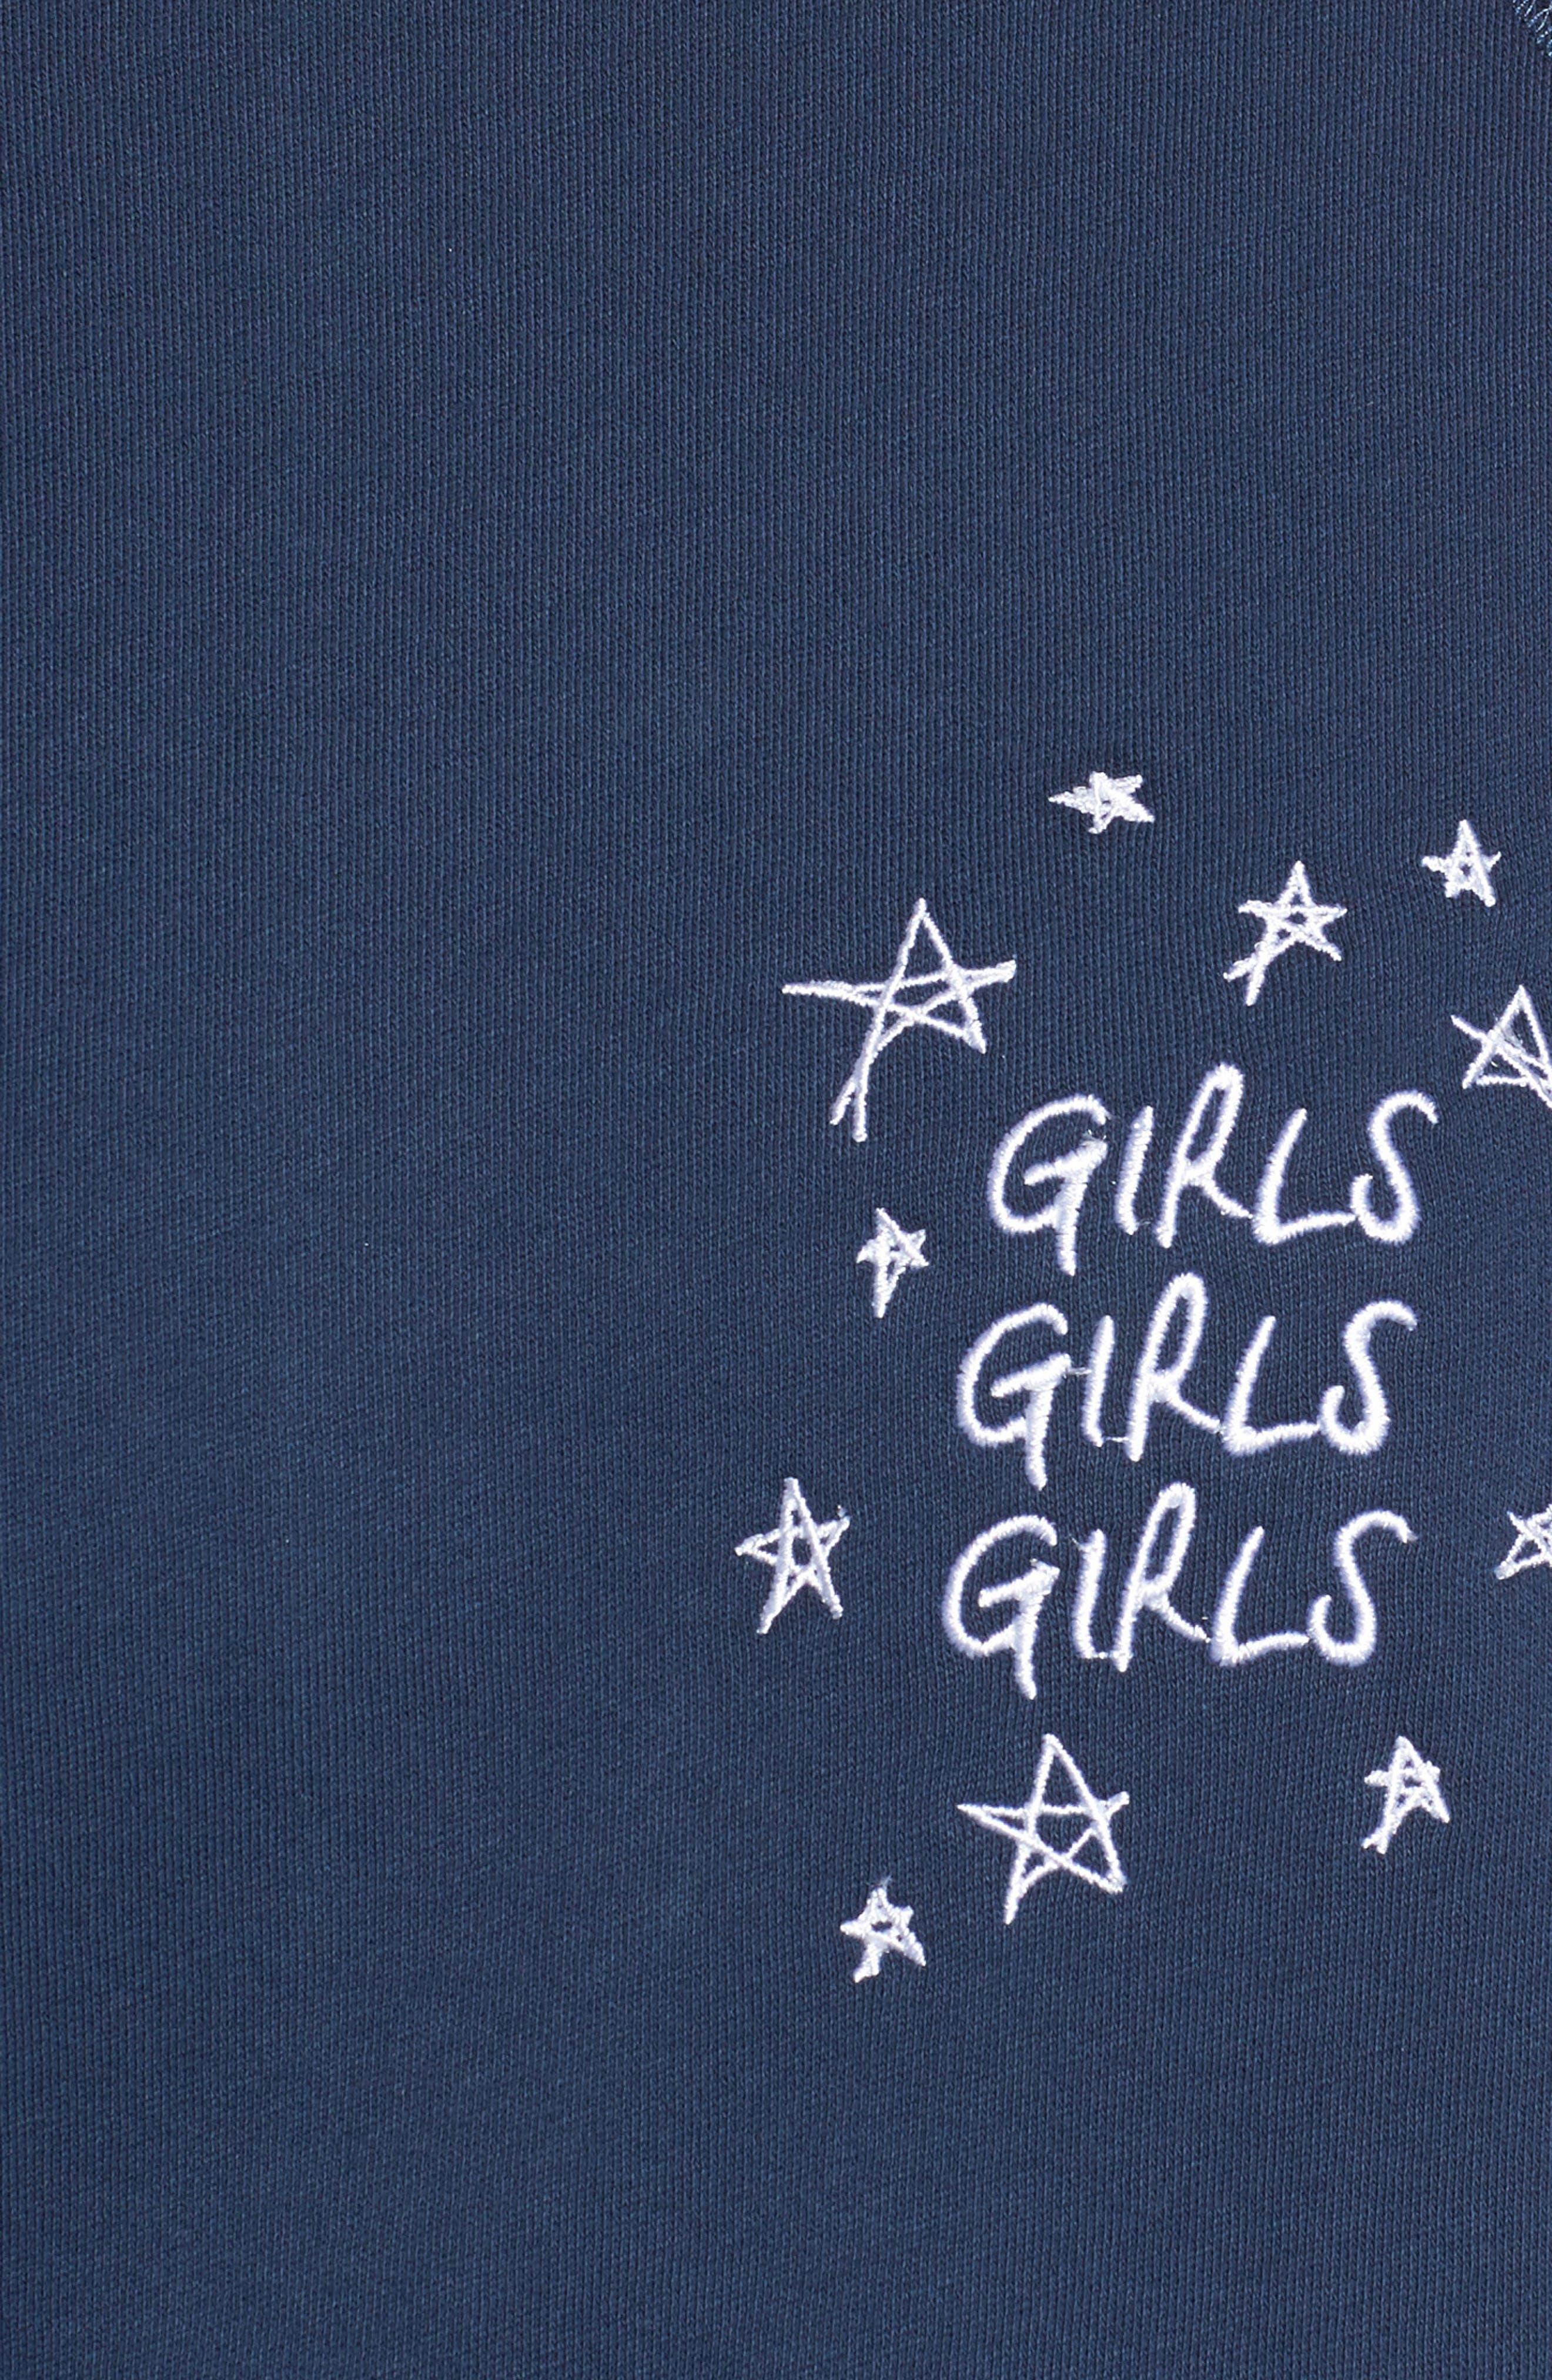 Girls Girls Girls Embroidered Sweatshirt,                             Alternate thumbnail 5, color,                             Navy